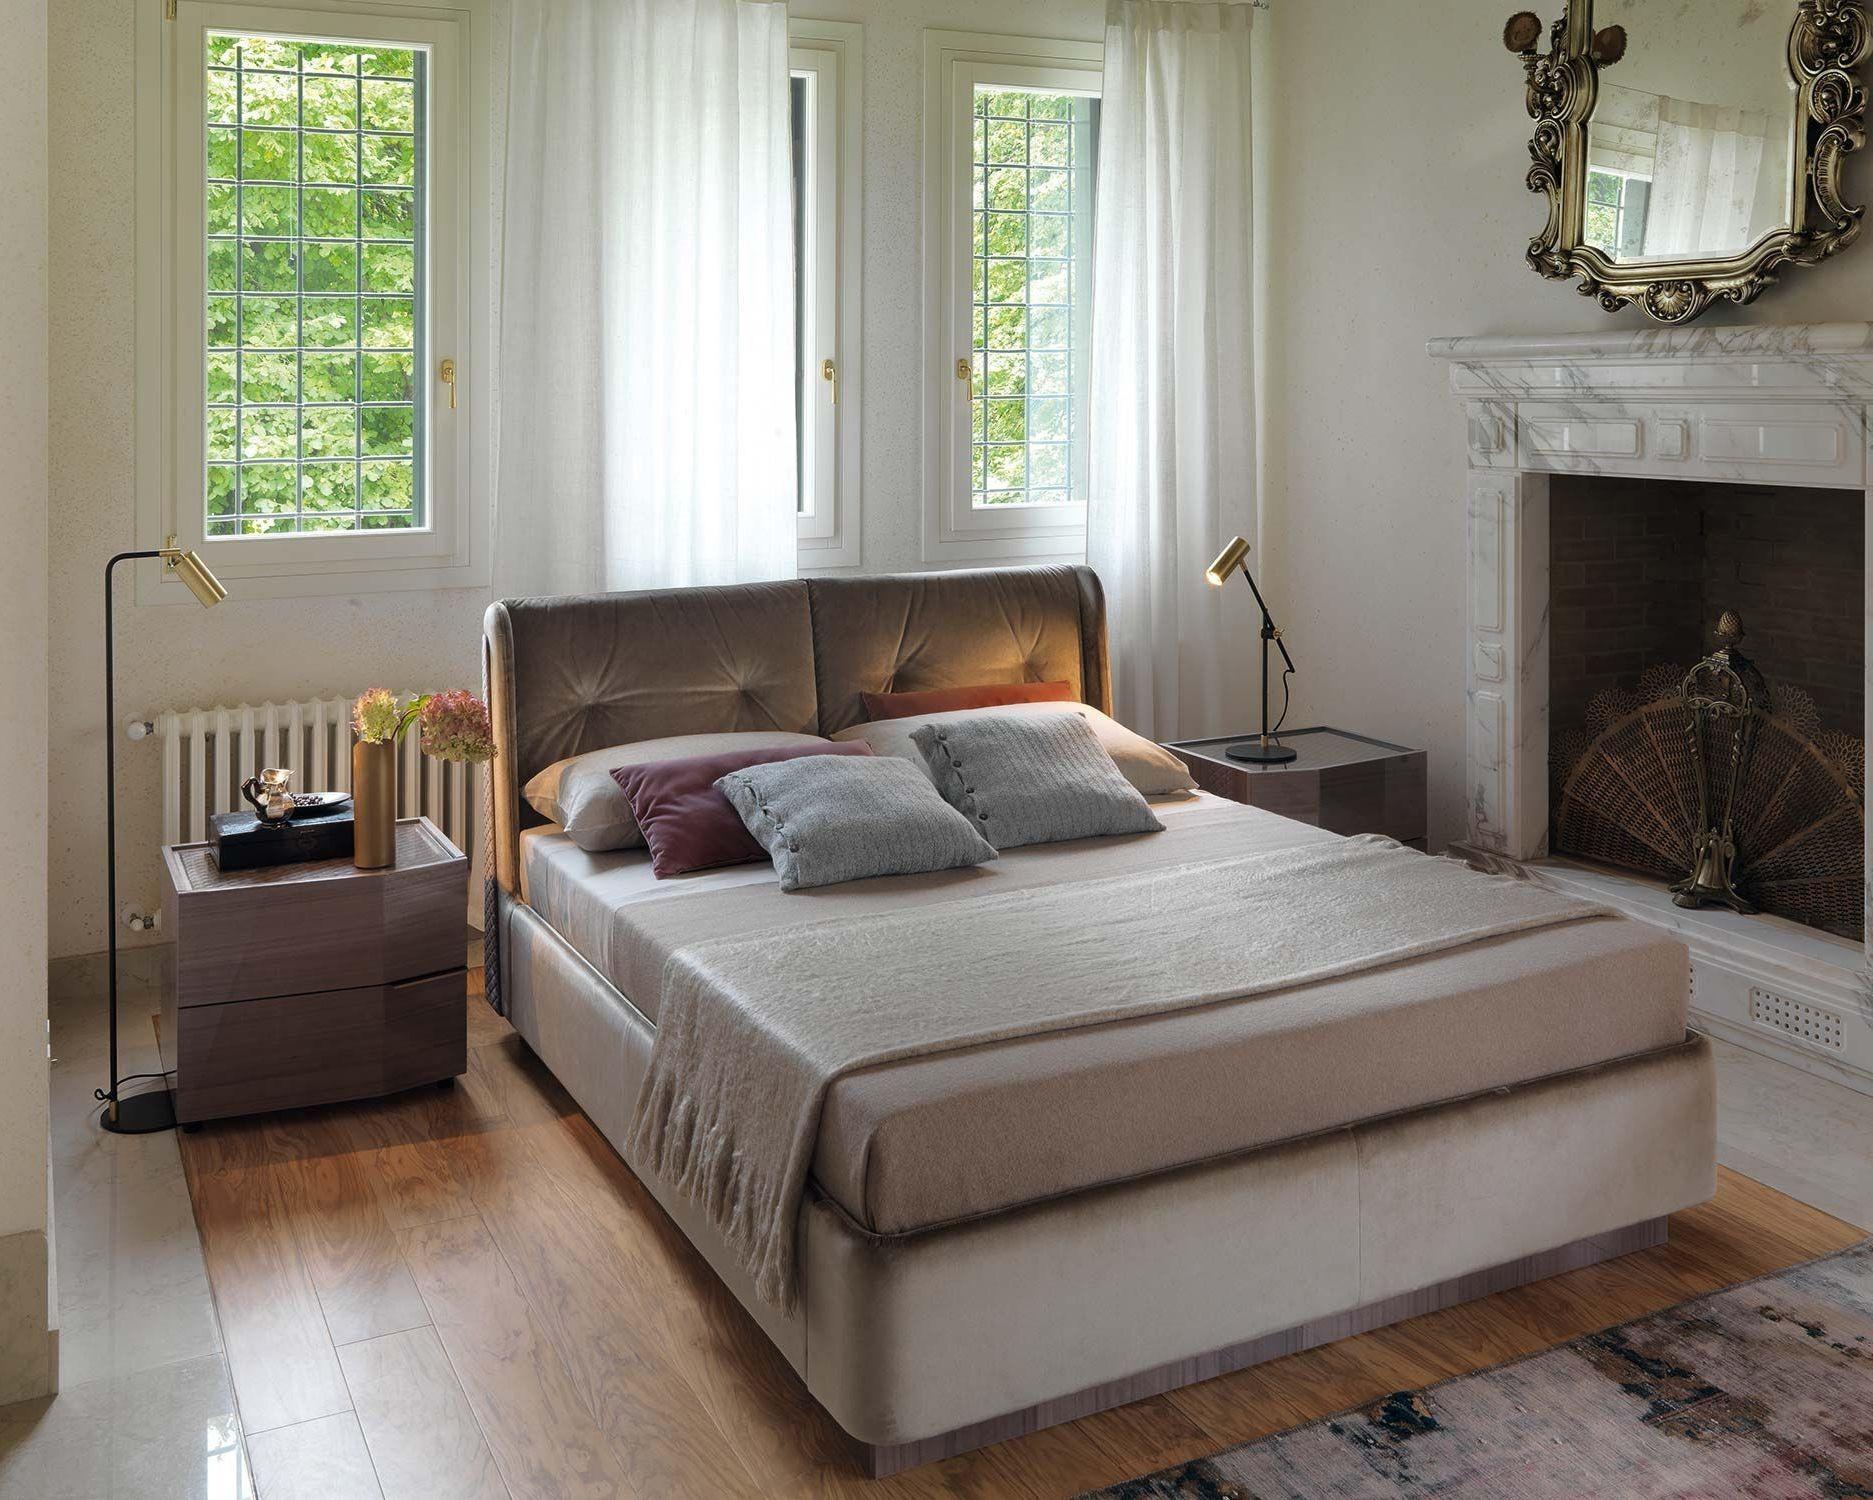 Chimera Tortora Zoe Upholstered Platform Bedroom Set